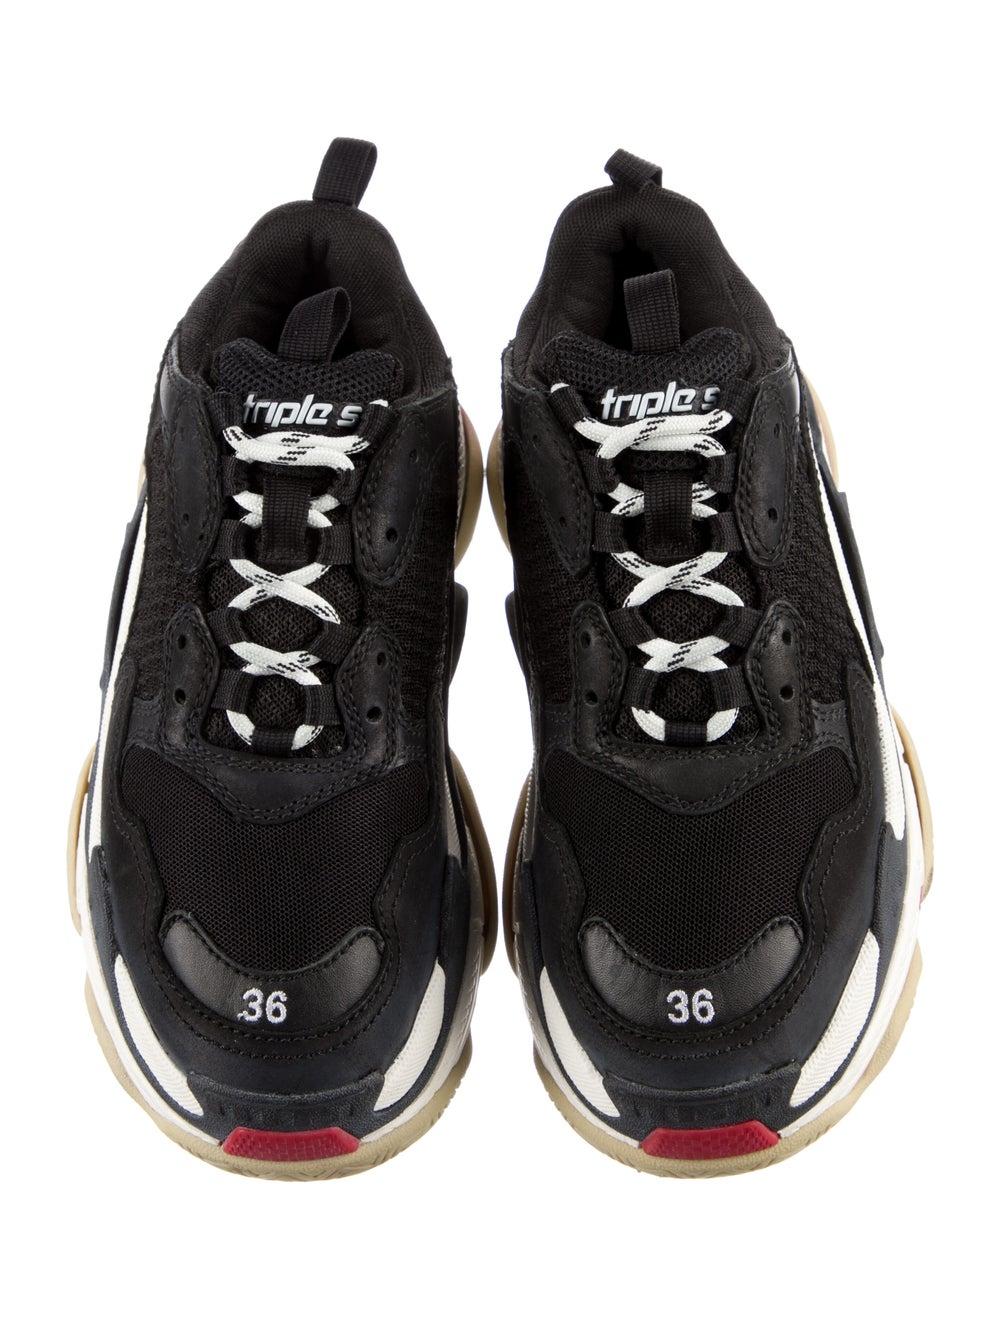 Balenciaga Triple S Sneakers Chunky Sneakers Black - image 3